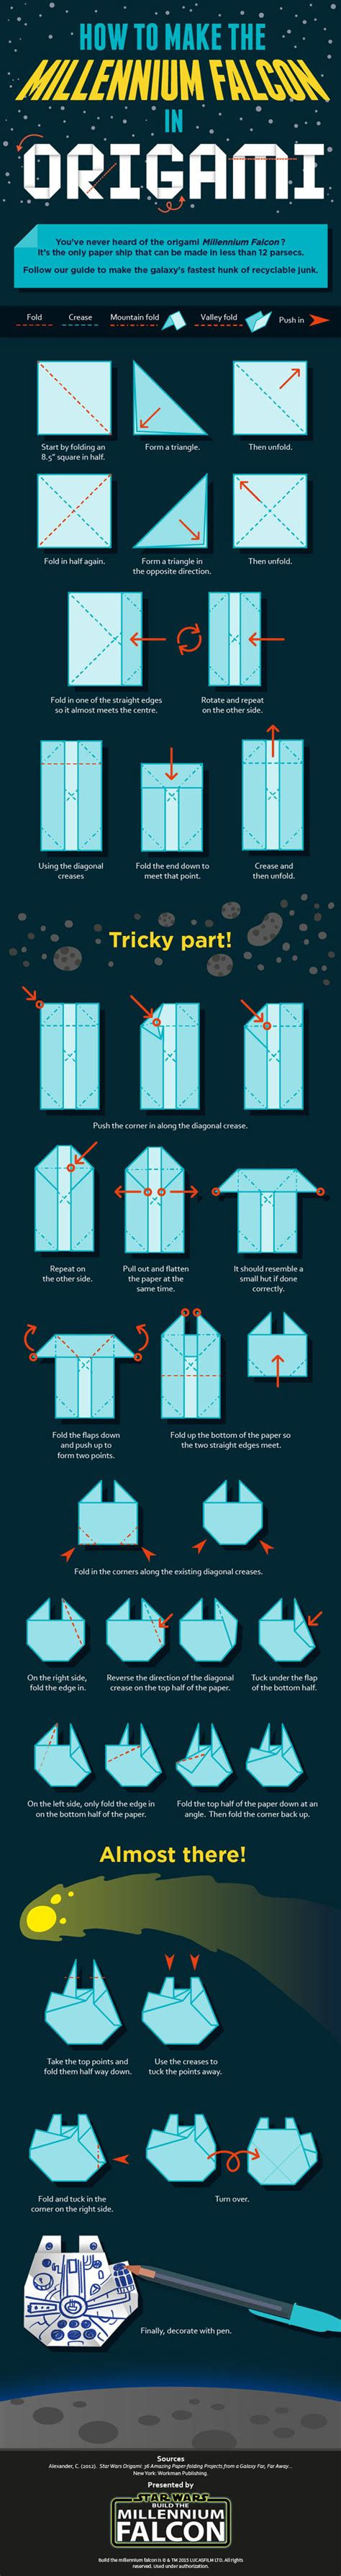 millennium falcon origami how to make an origami millennium falcon technabob